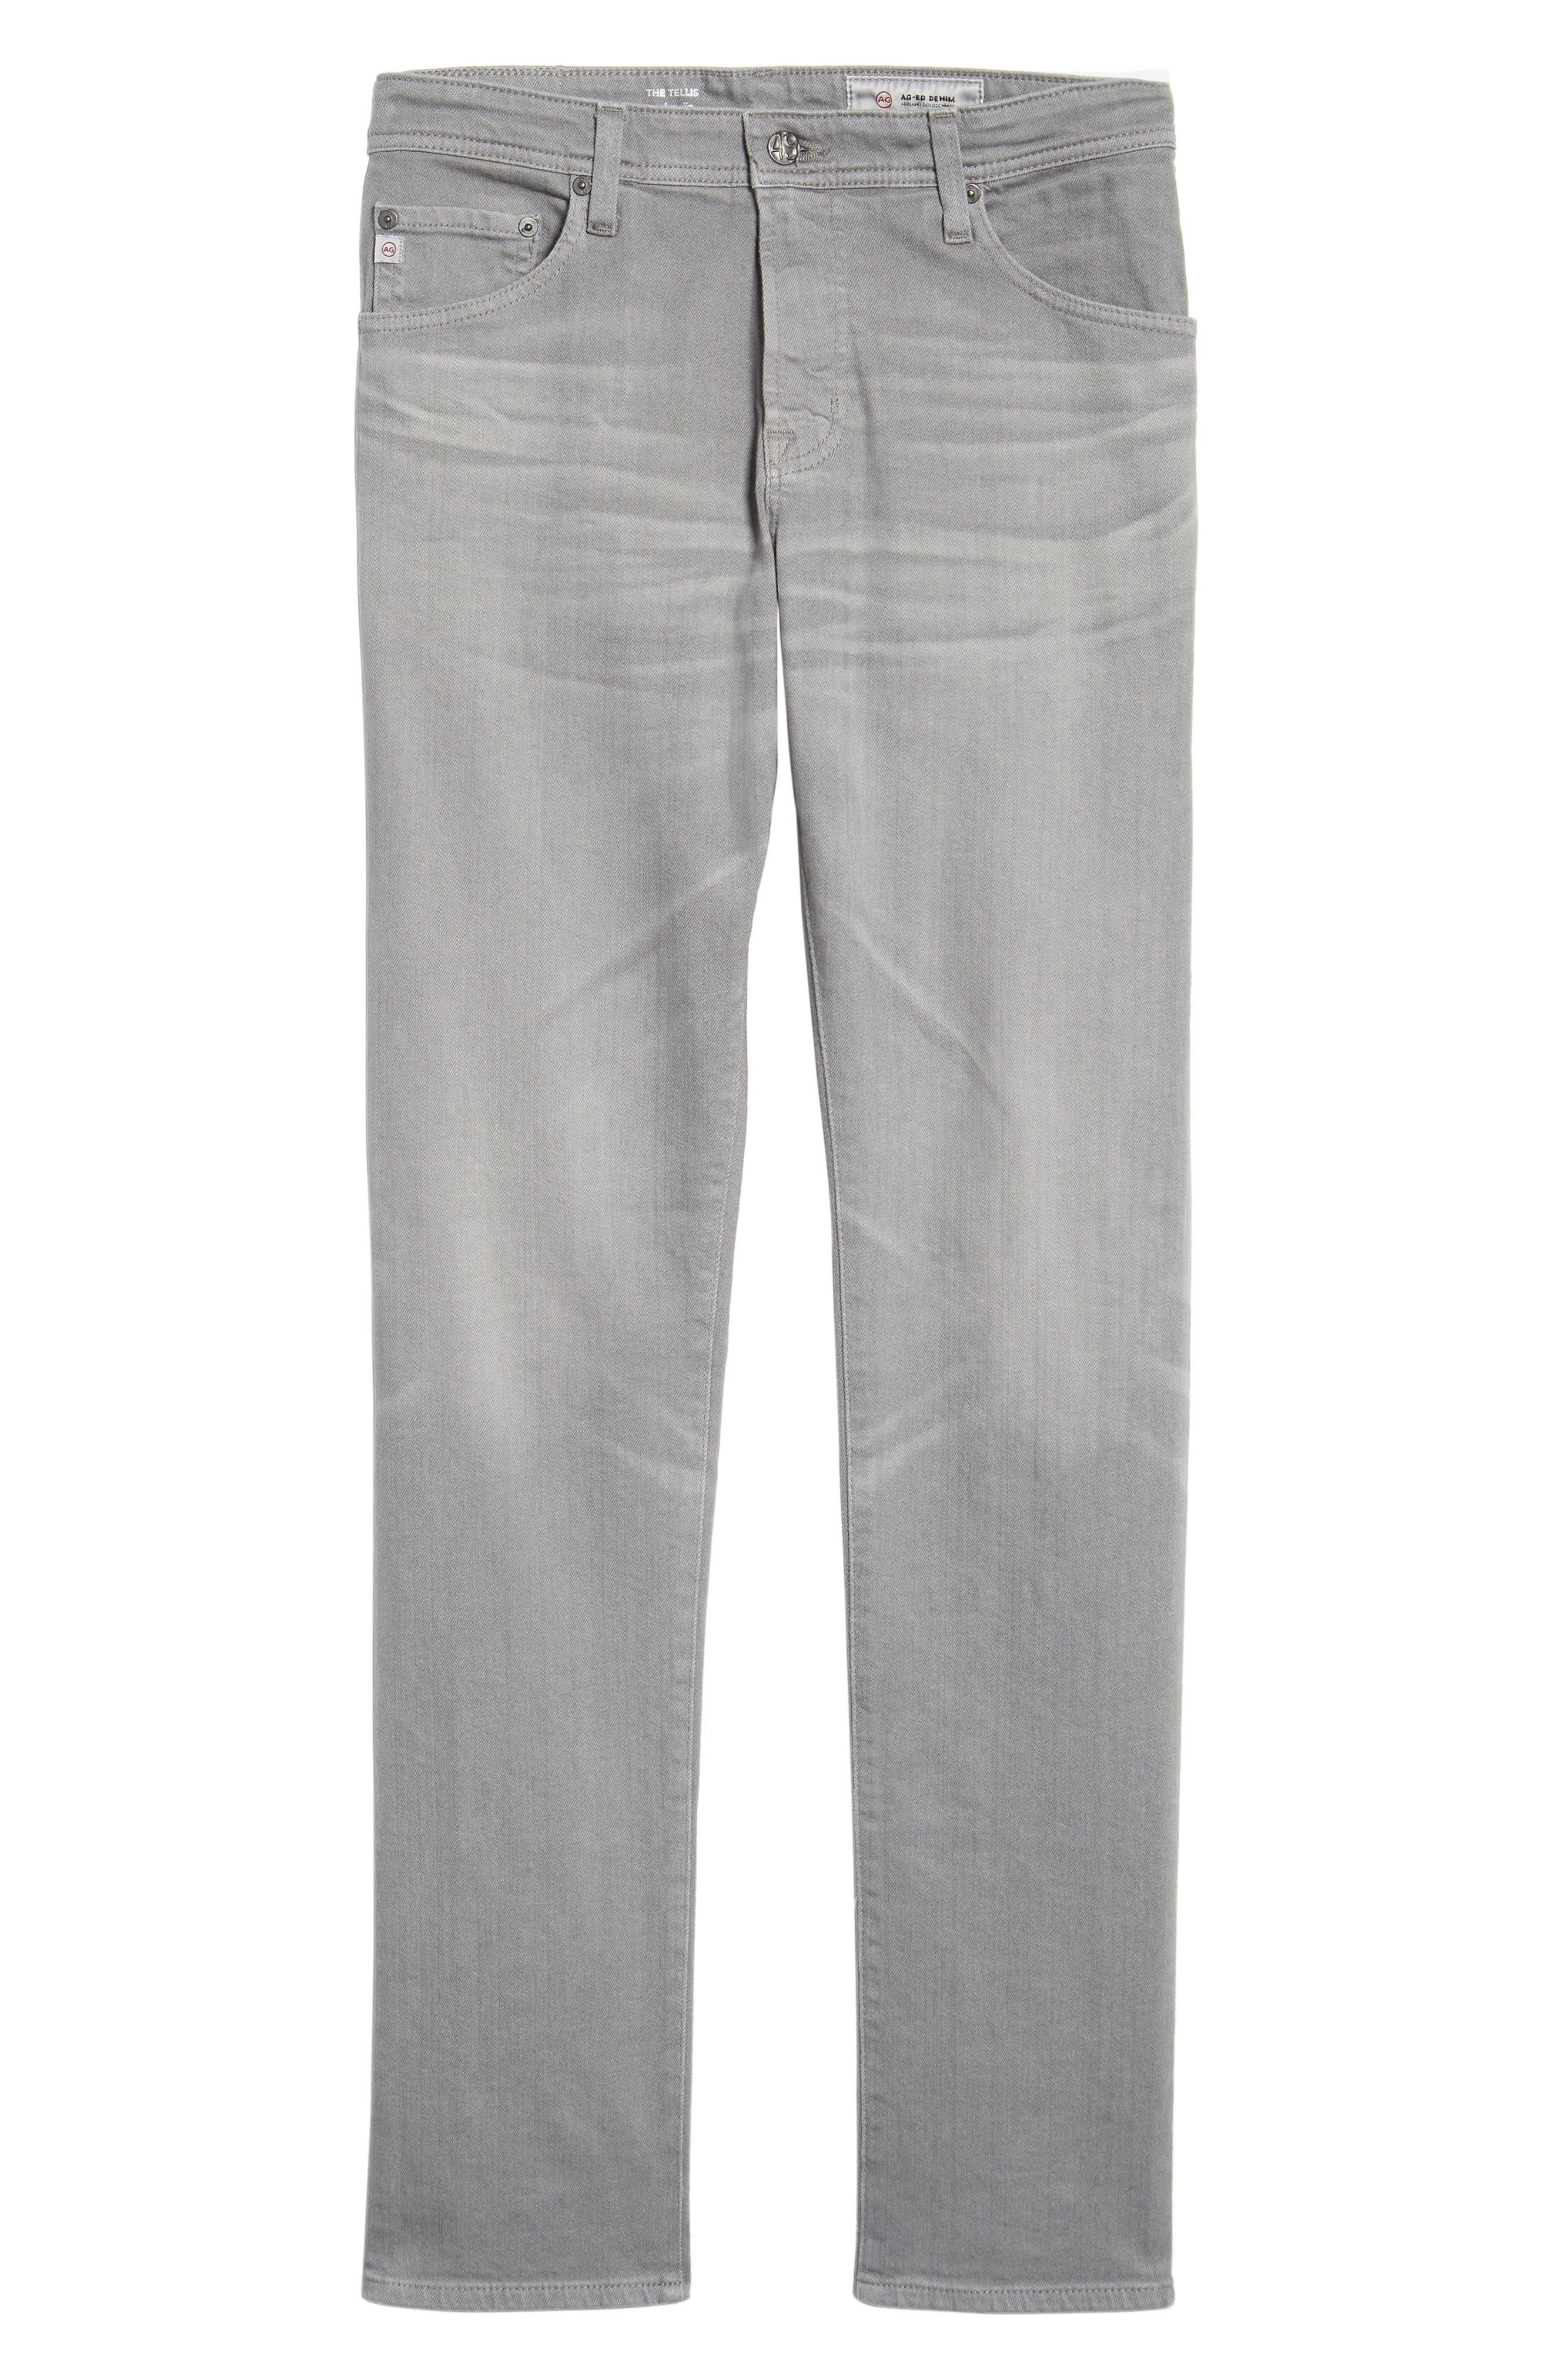 Tellis Modern Slim Twill Pants,                             Alternate thumbnail 12, color,